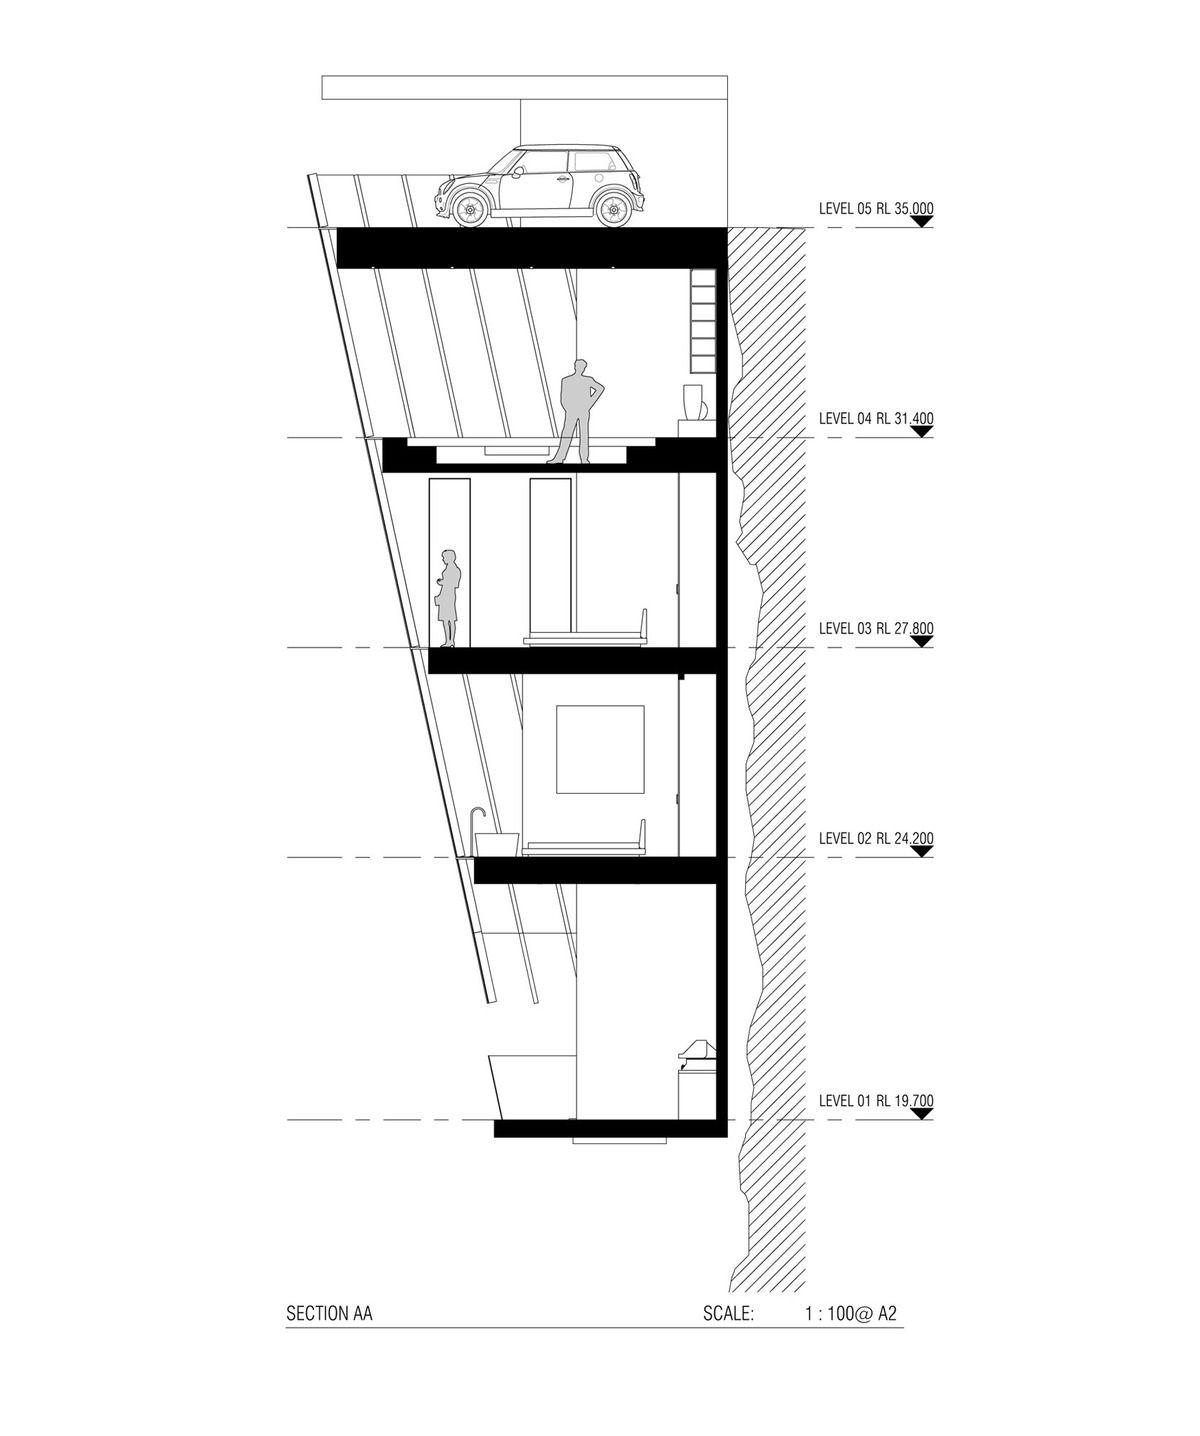 1200x1436 living on the edge australians design house that hangs off cliff